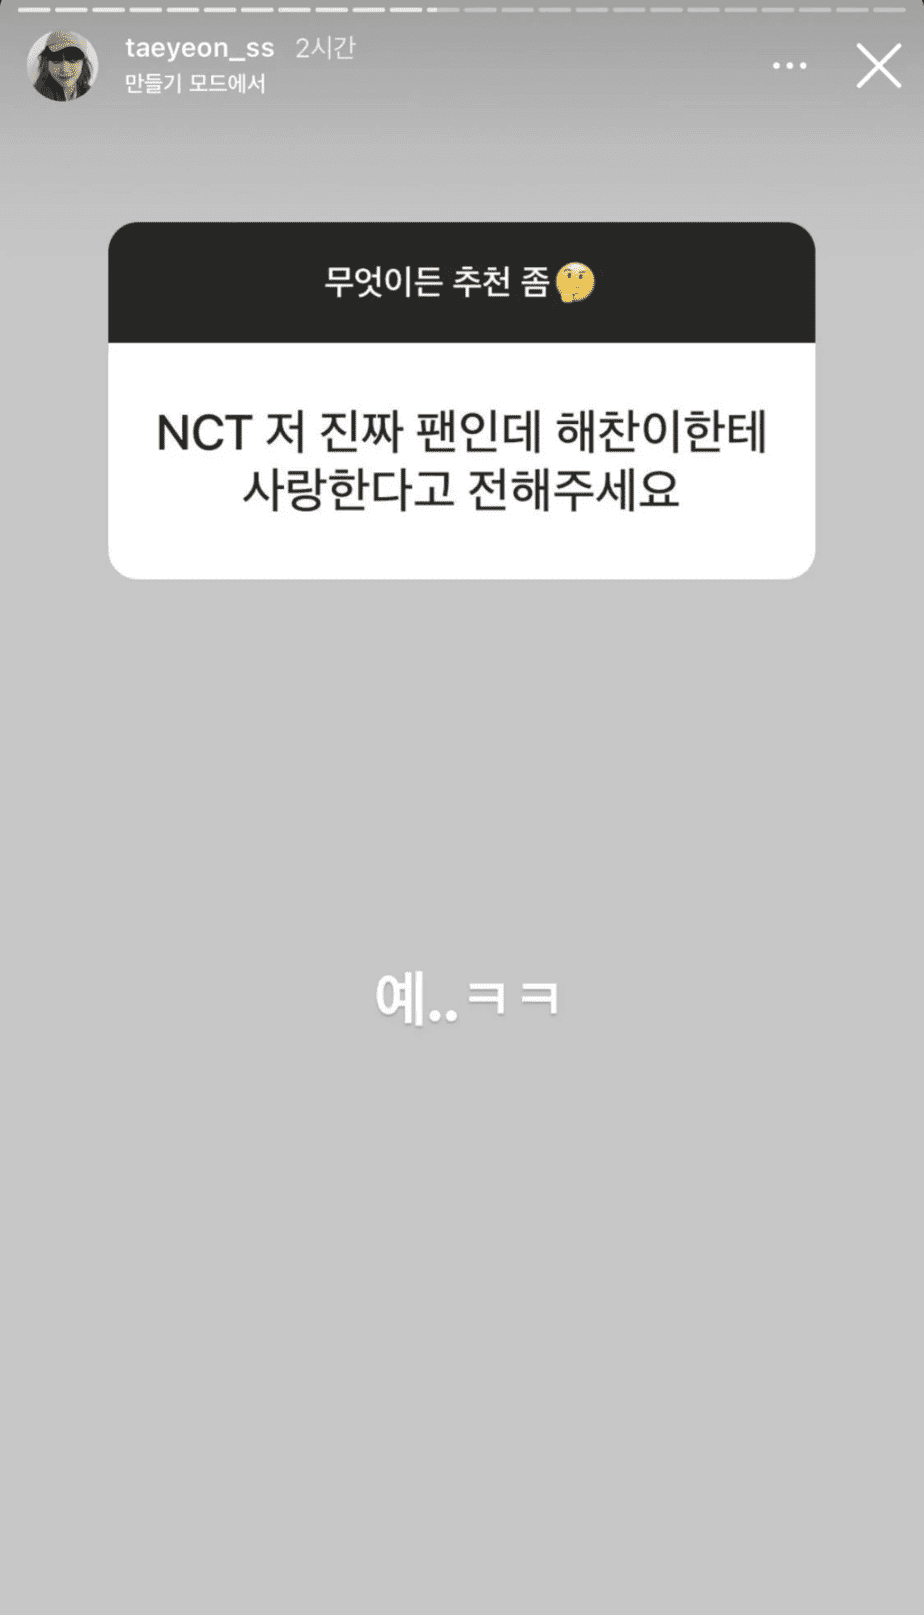 Taeyeon-nct-instagram